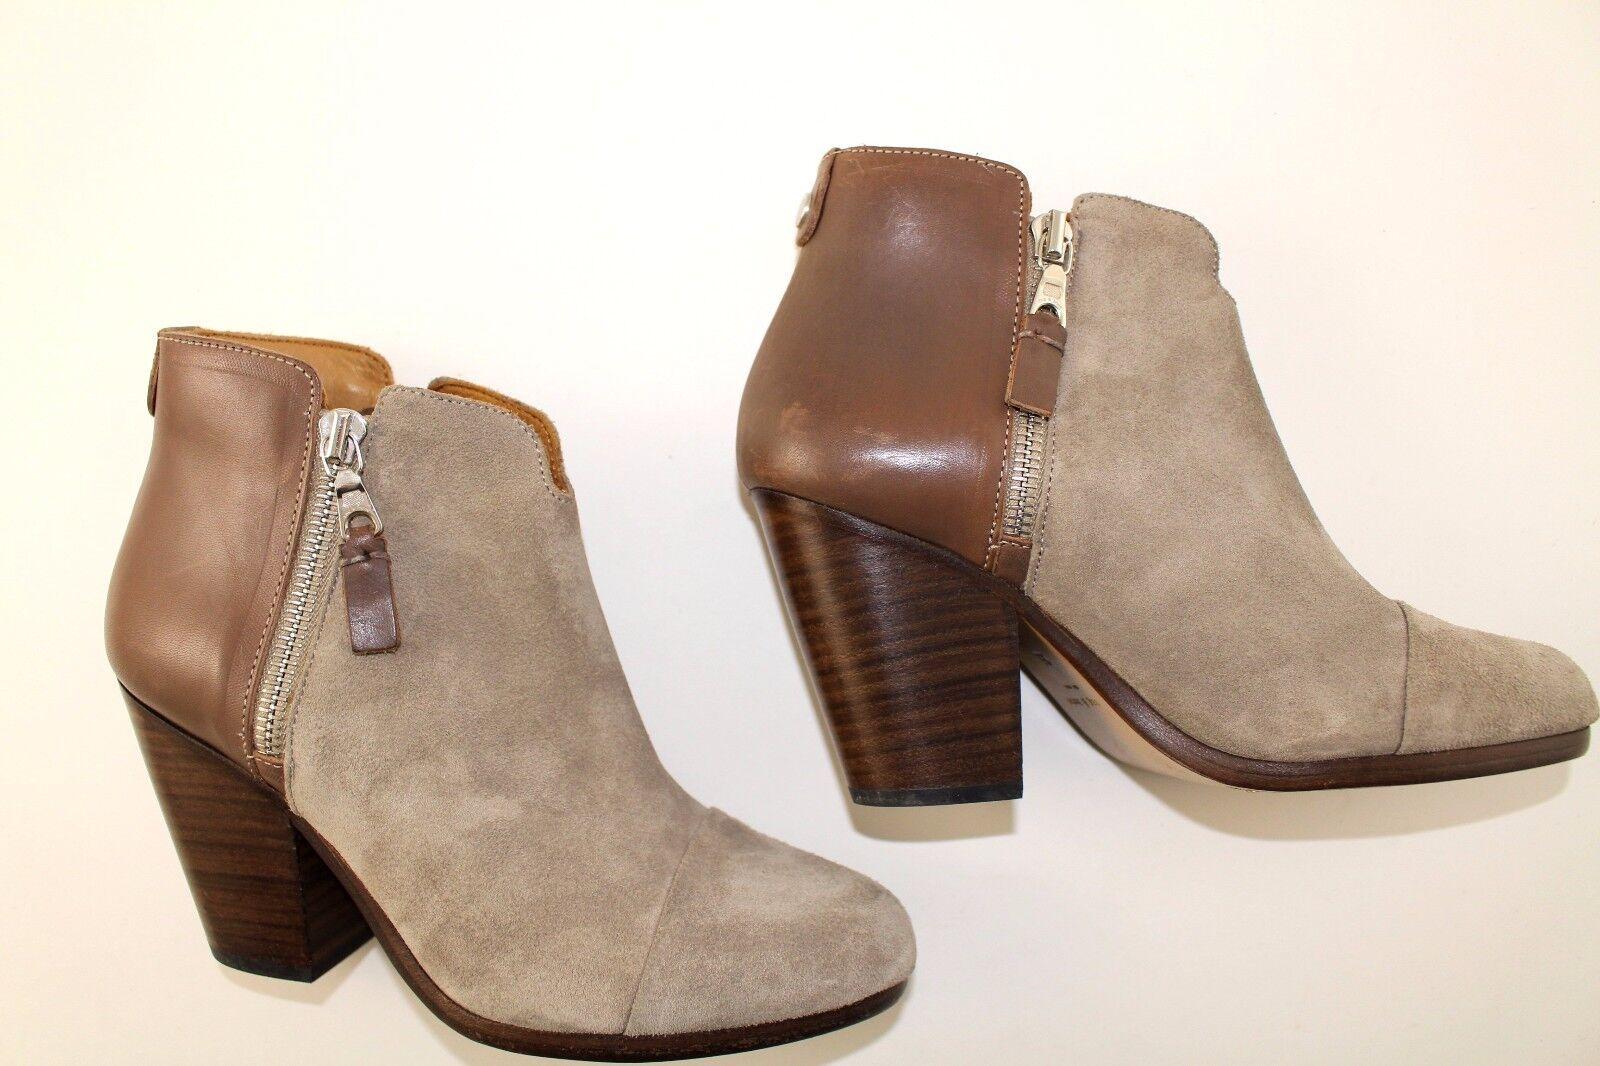 525 RAG & BONE Margot Stone combo Suede   Leather Booties sz EU 35   US 5 grey